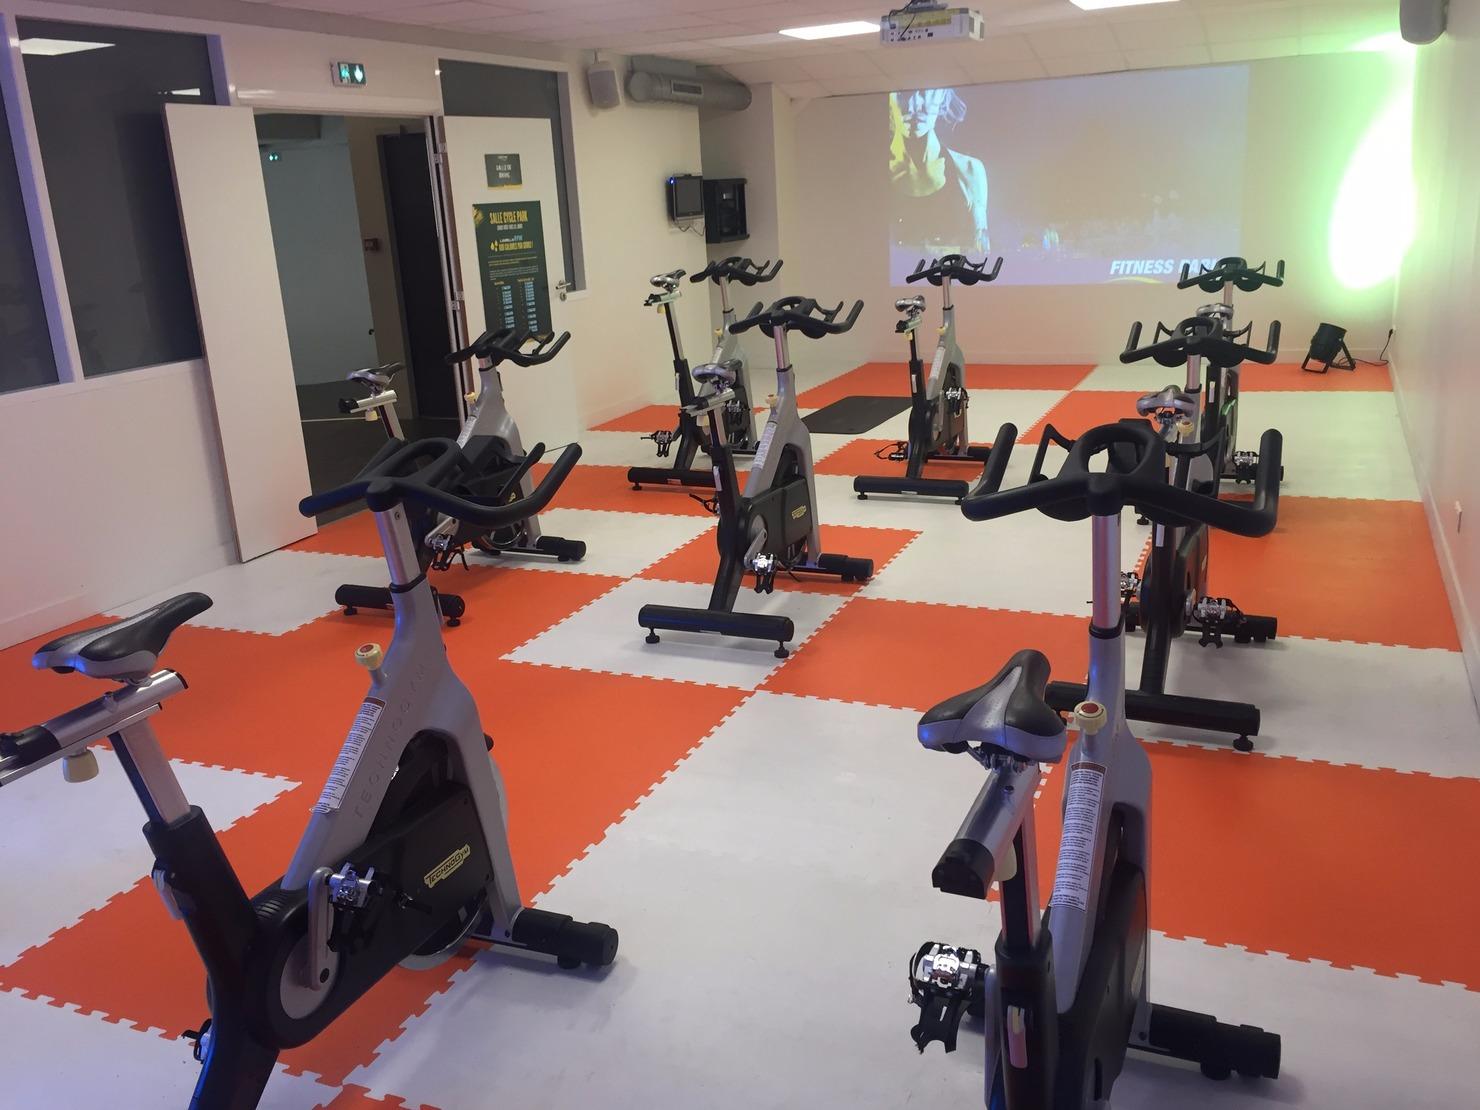 Fitness Park Paris - Théatre